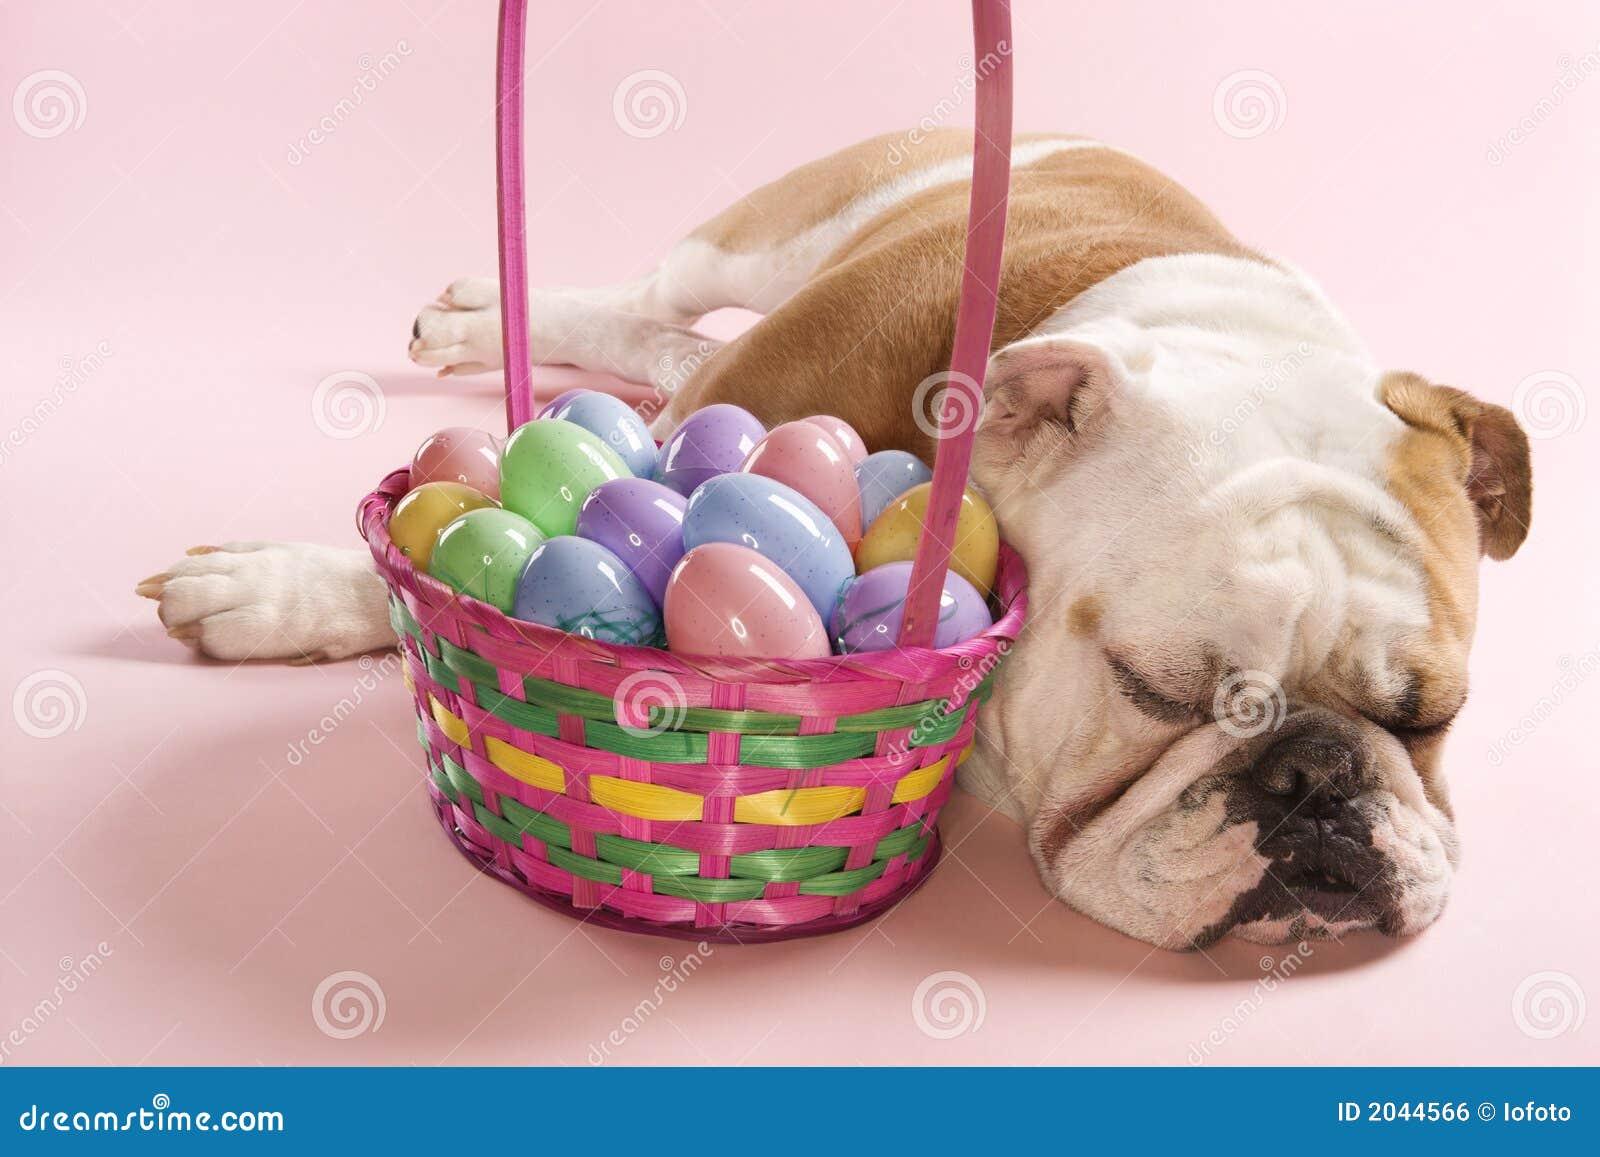 Bulldog Sleeping Beside Basket Stock Photo Image Of Tired